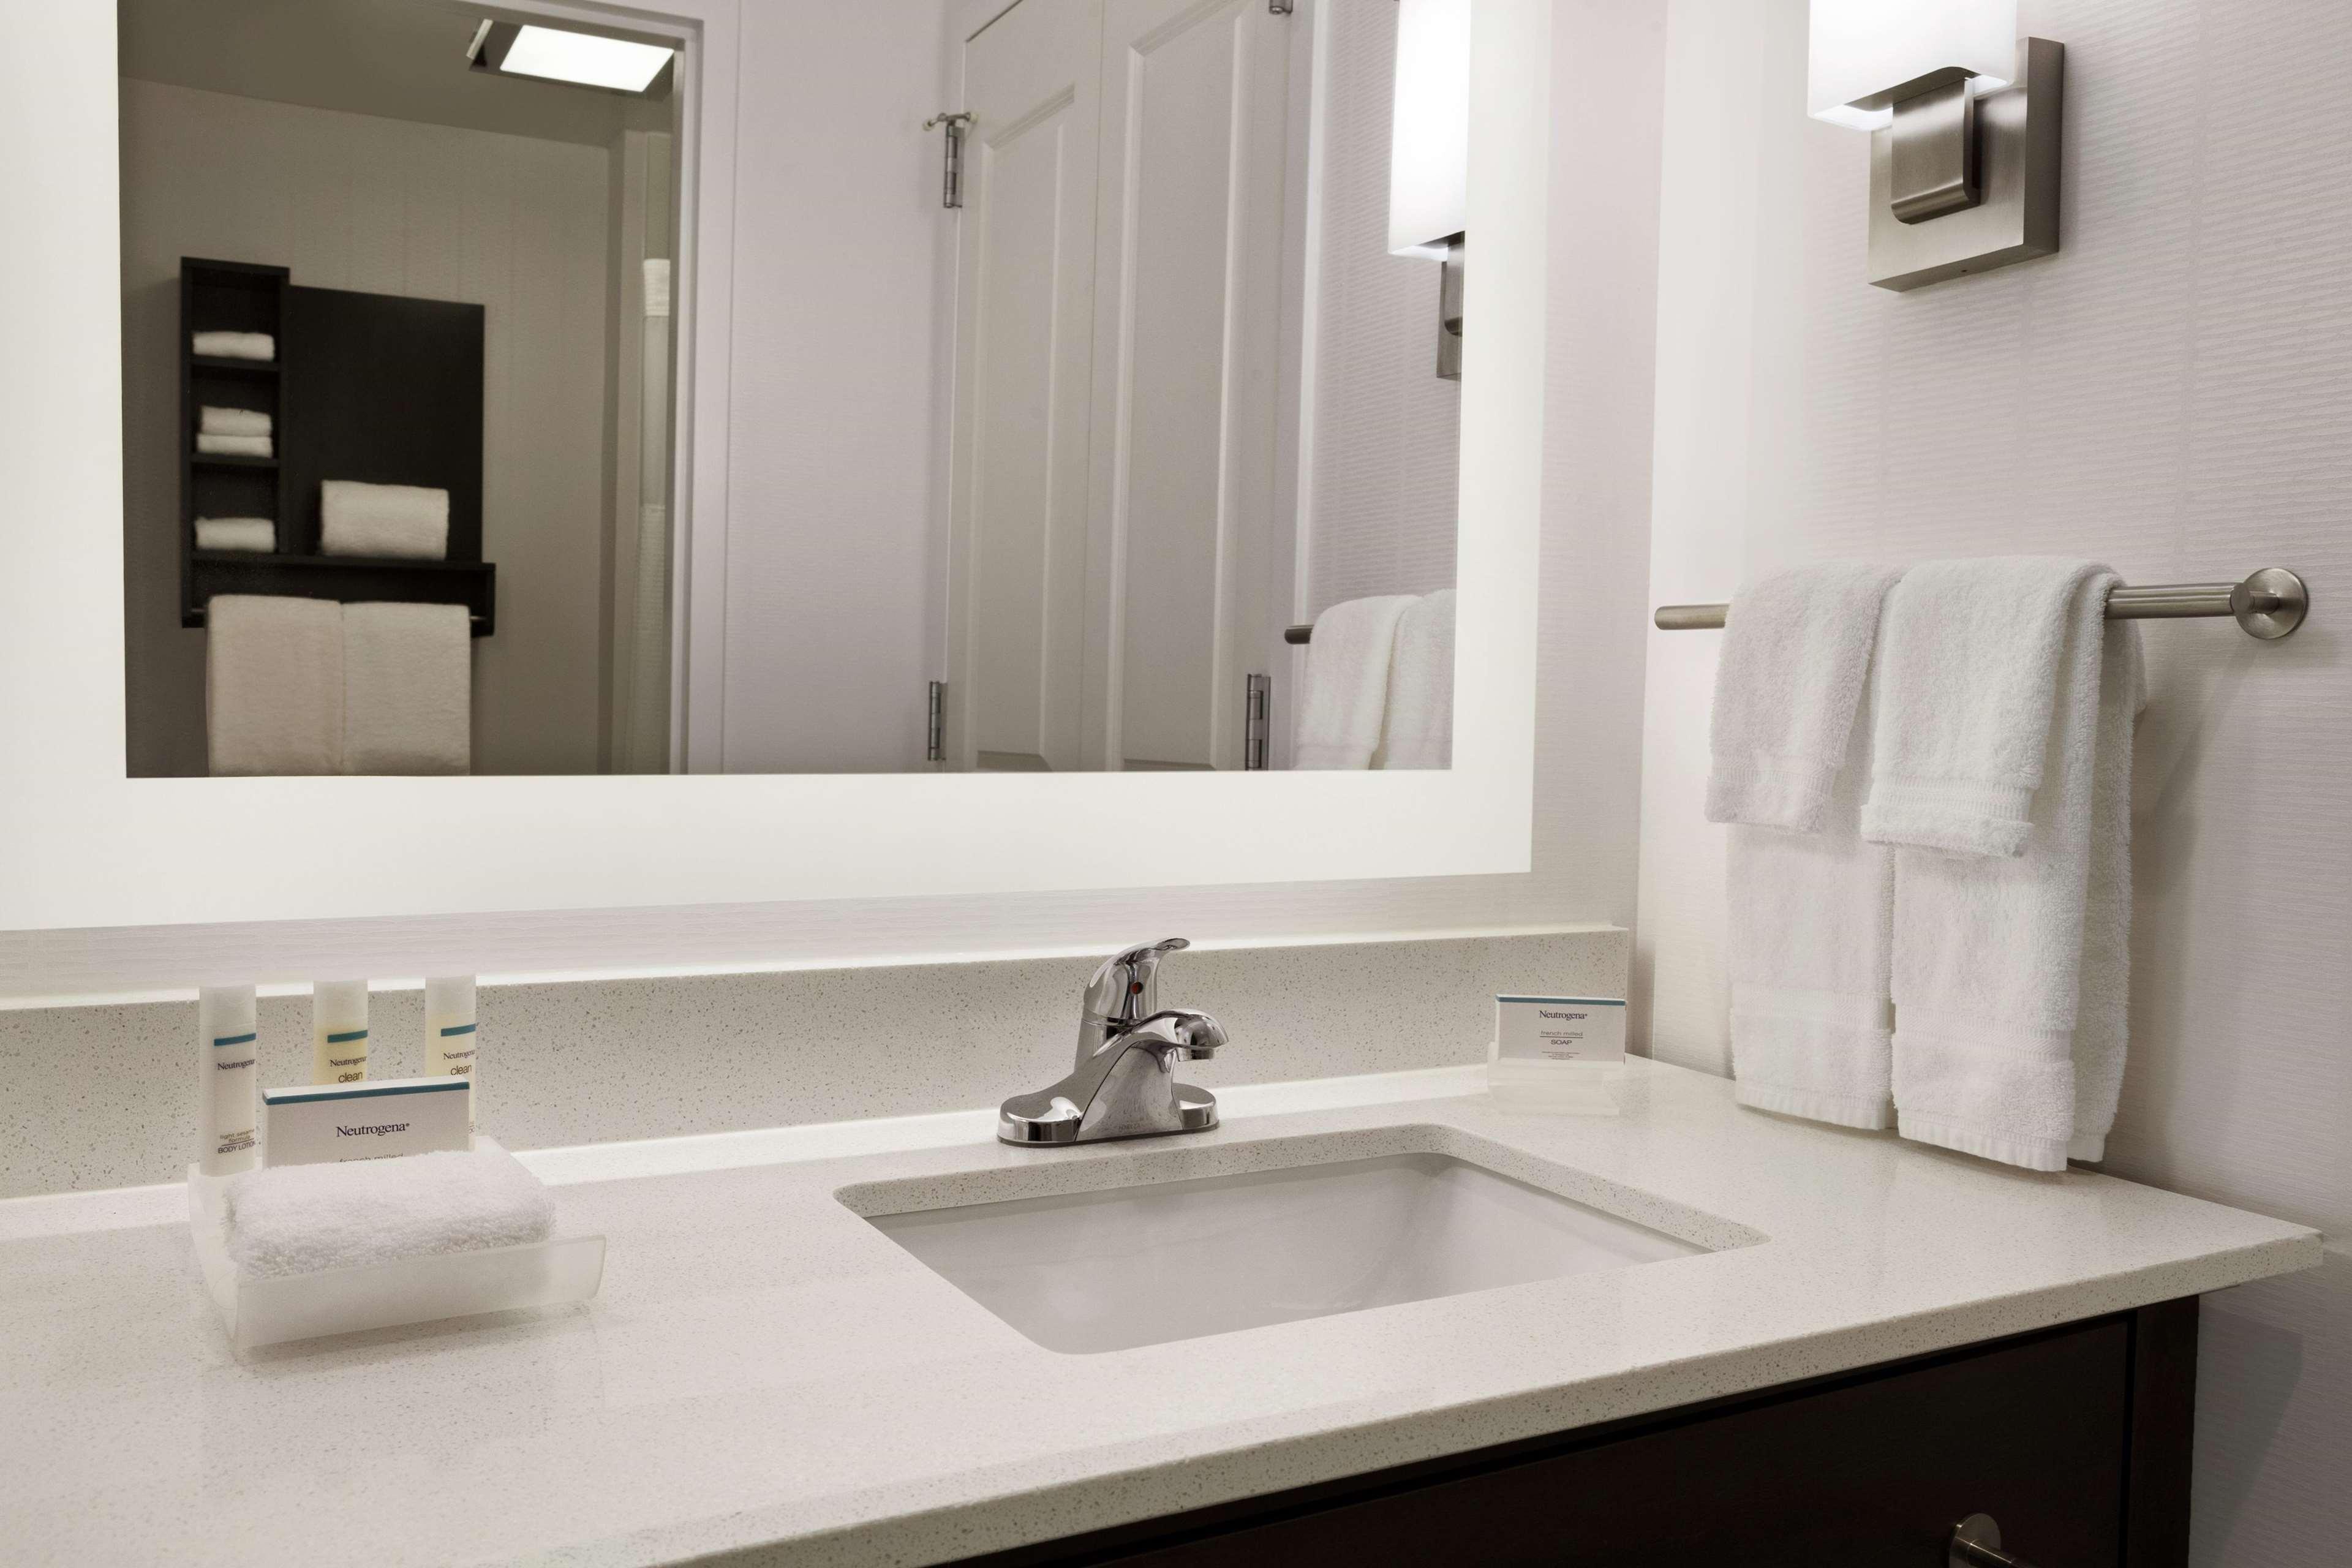 Homewood Suites by Hilton Charlotte/SouthPark image 12